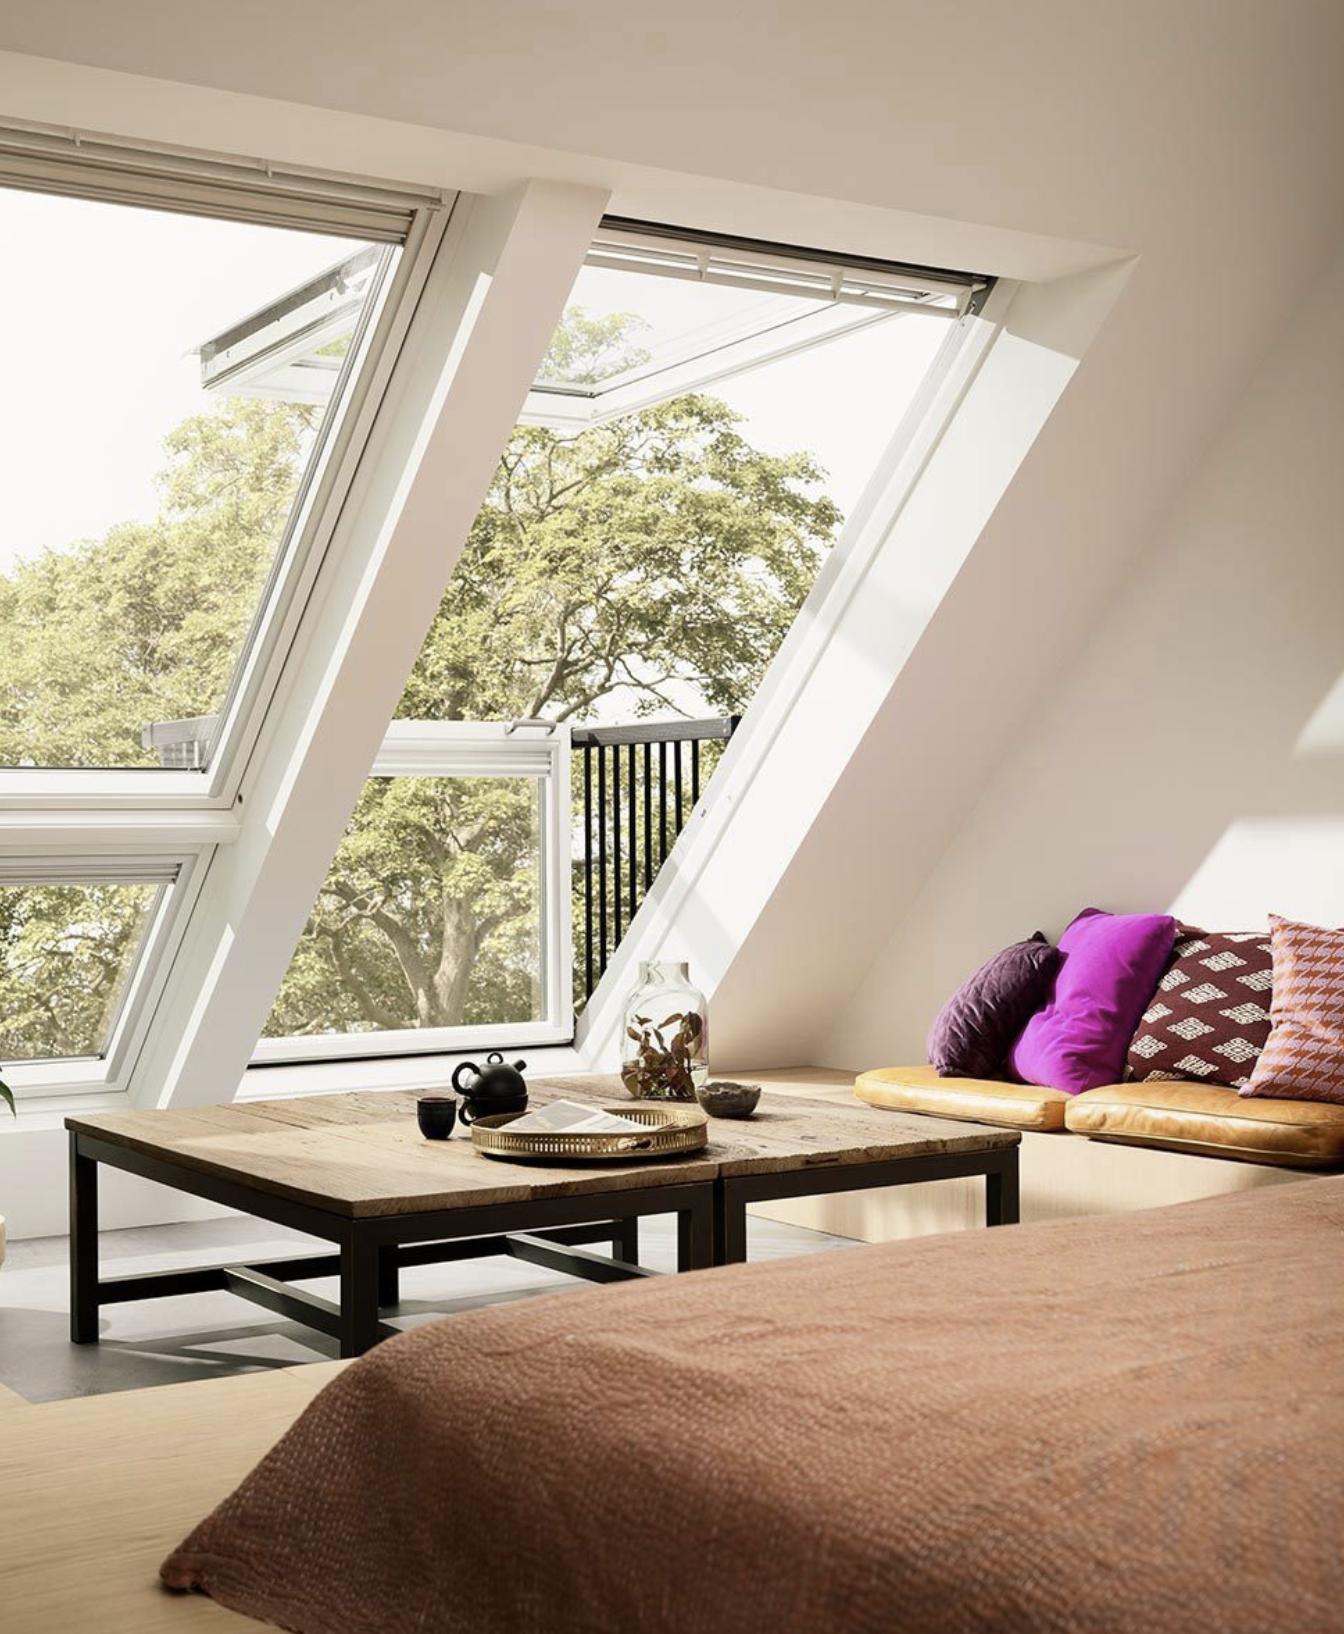 Velux Cabrio Roof Window Velux Skylights Roof Window Loft Room